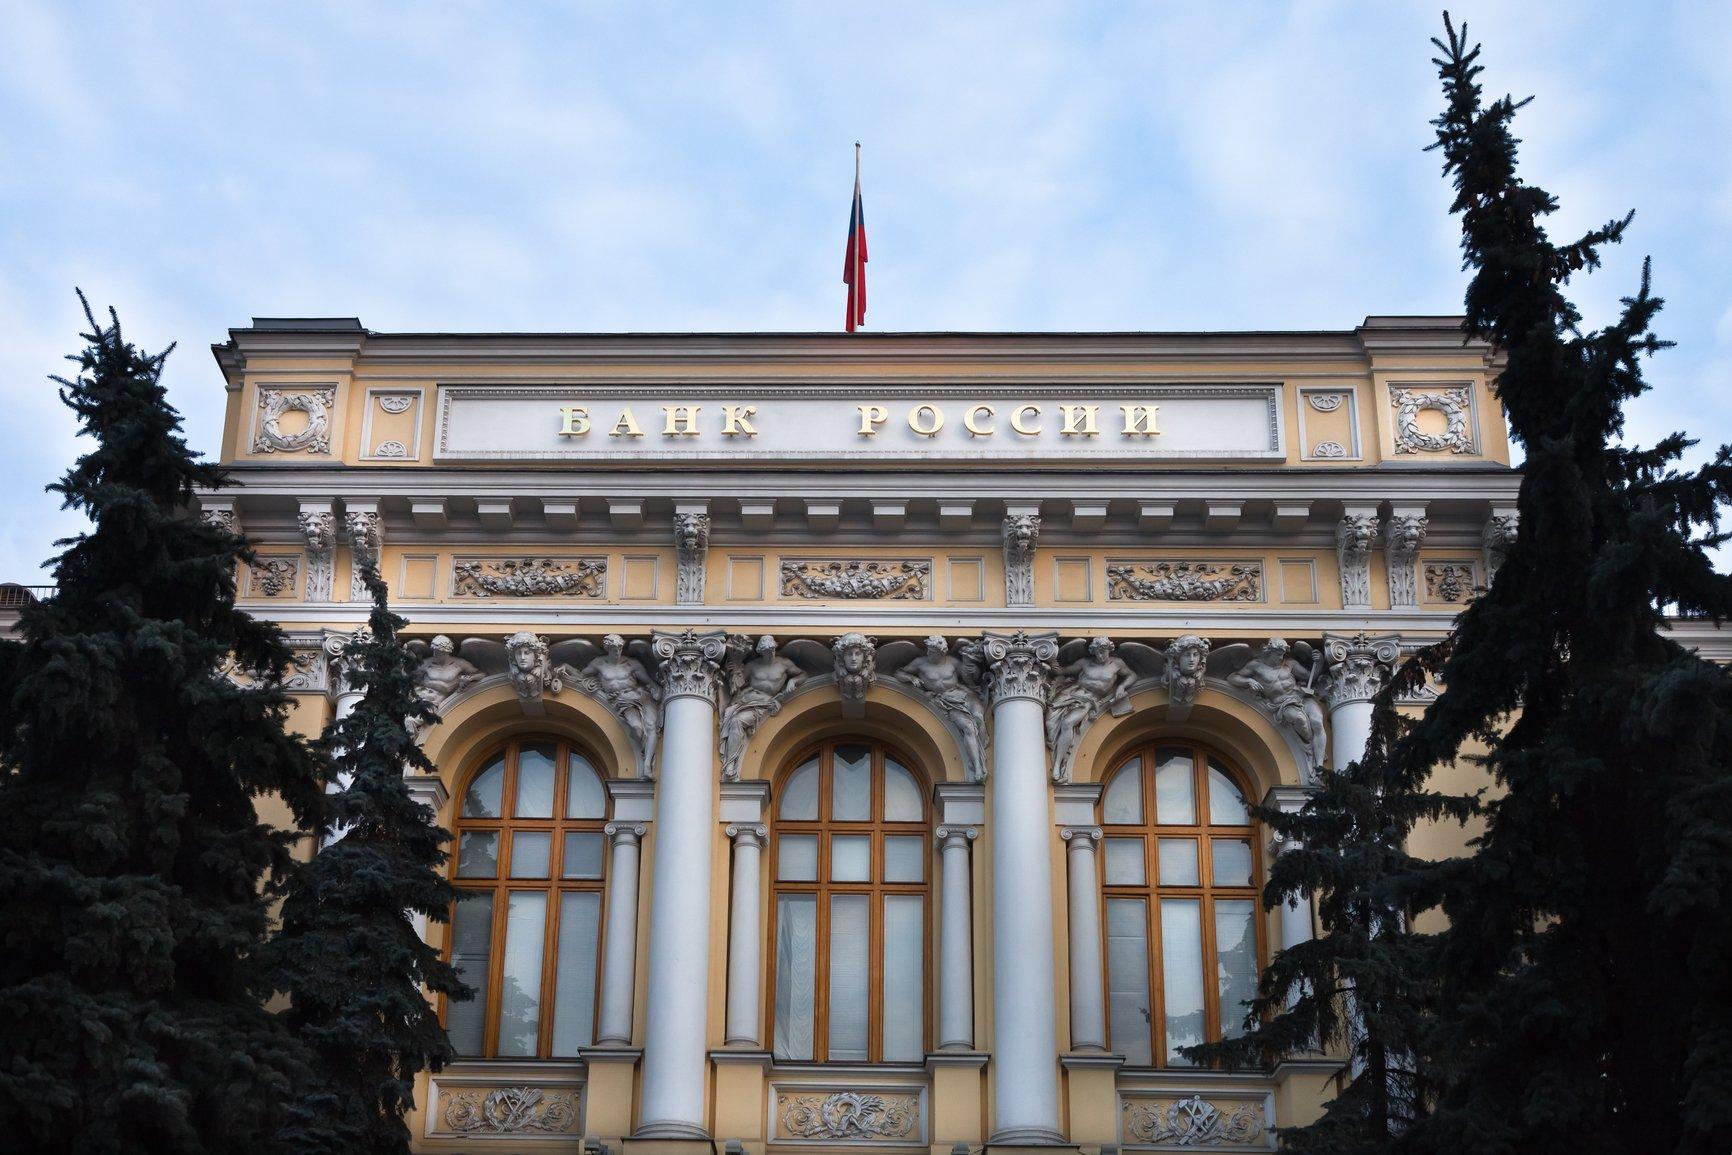 http://souz-lombardov.ru/wp-content/uploads/2017/06/1471931330_ruska-centralni-banka-pred-neresitelnym-rebusem.jpg